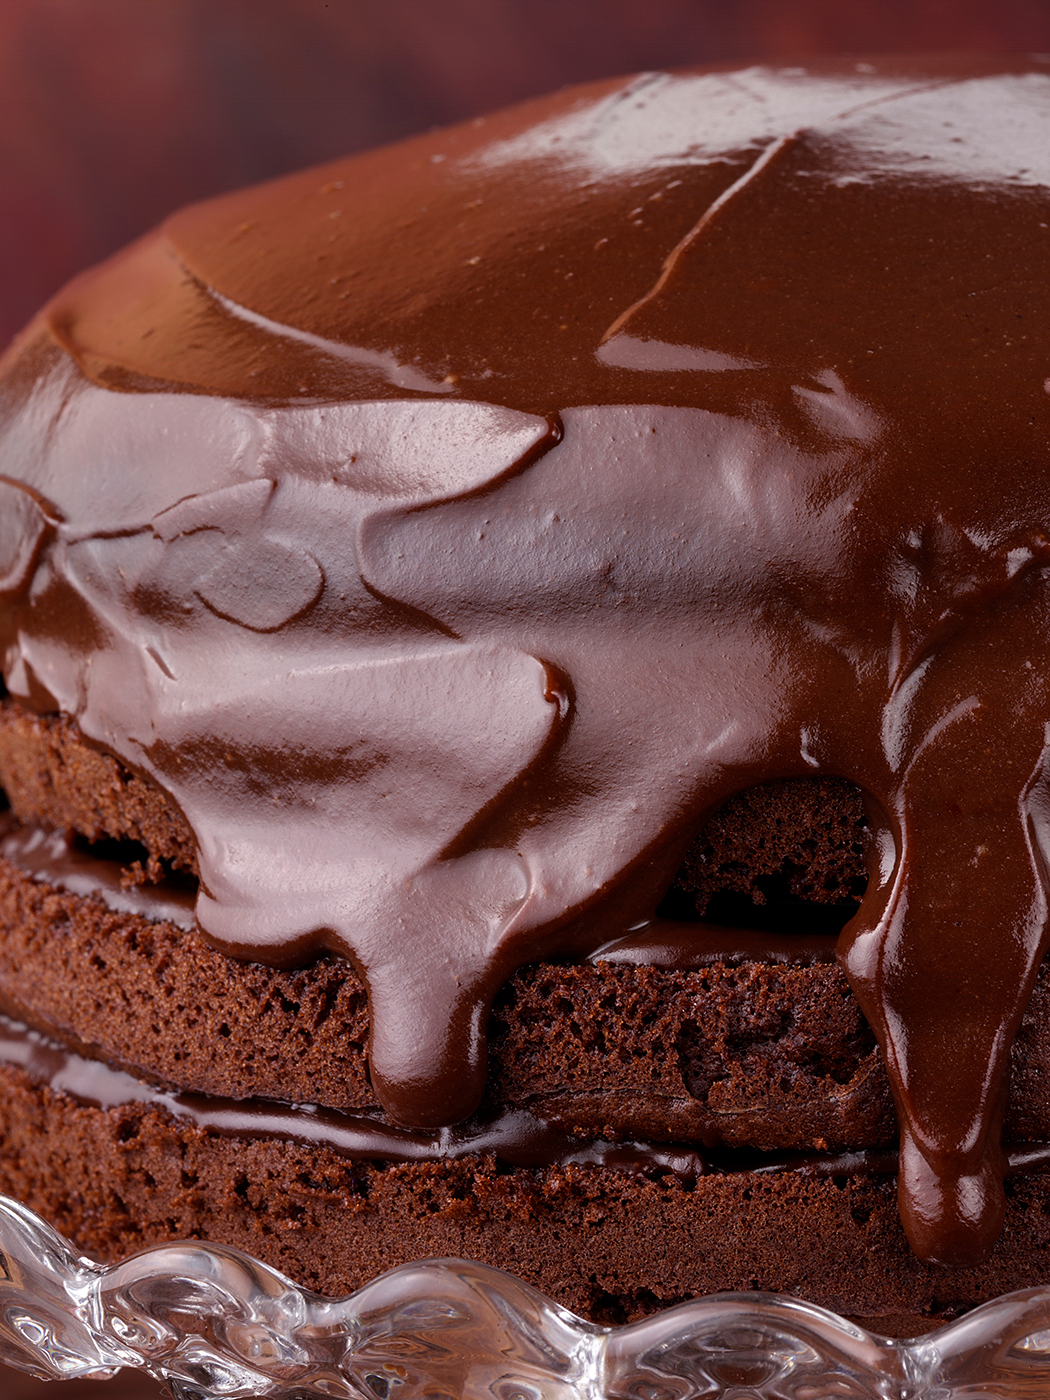 Chocolate Mocha cake with chocolate frosting